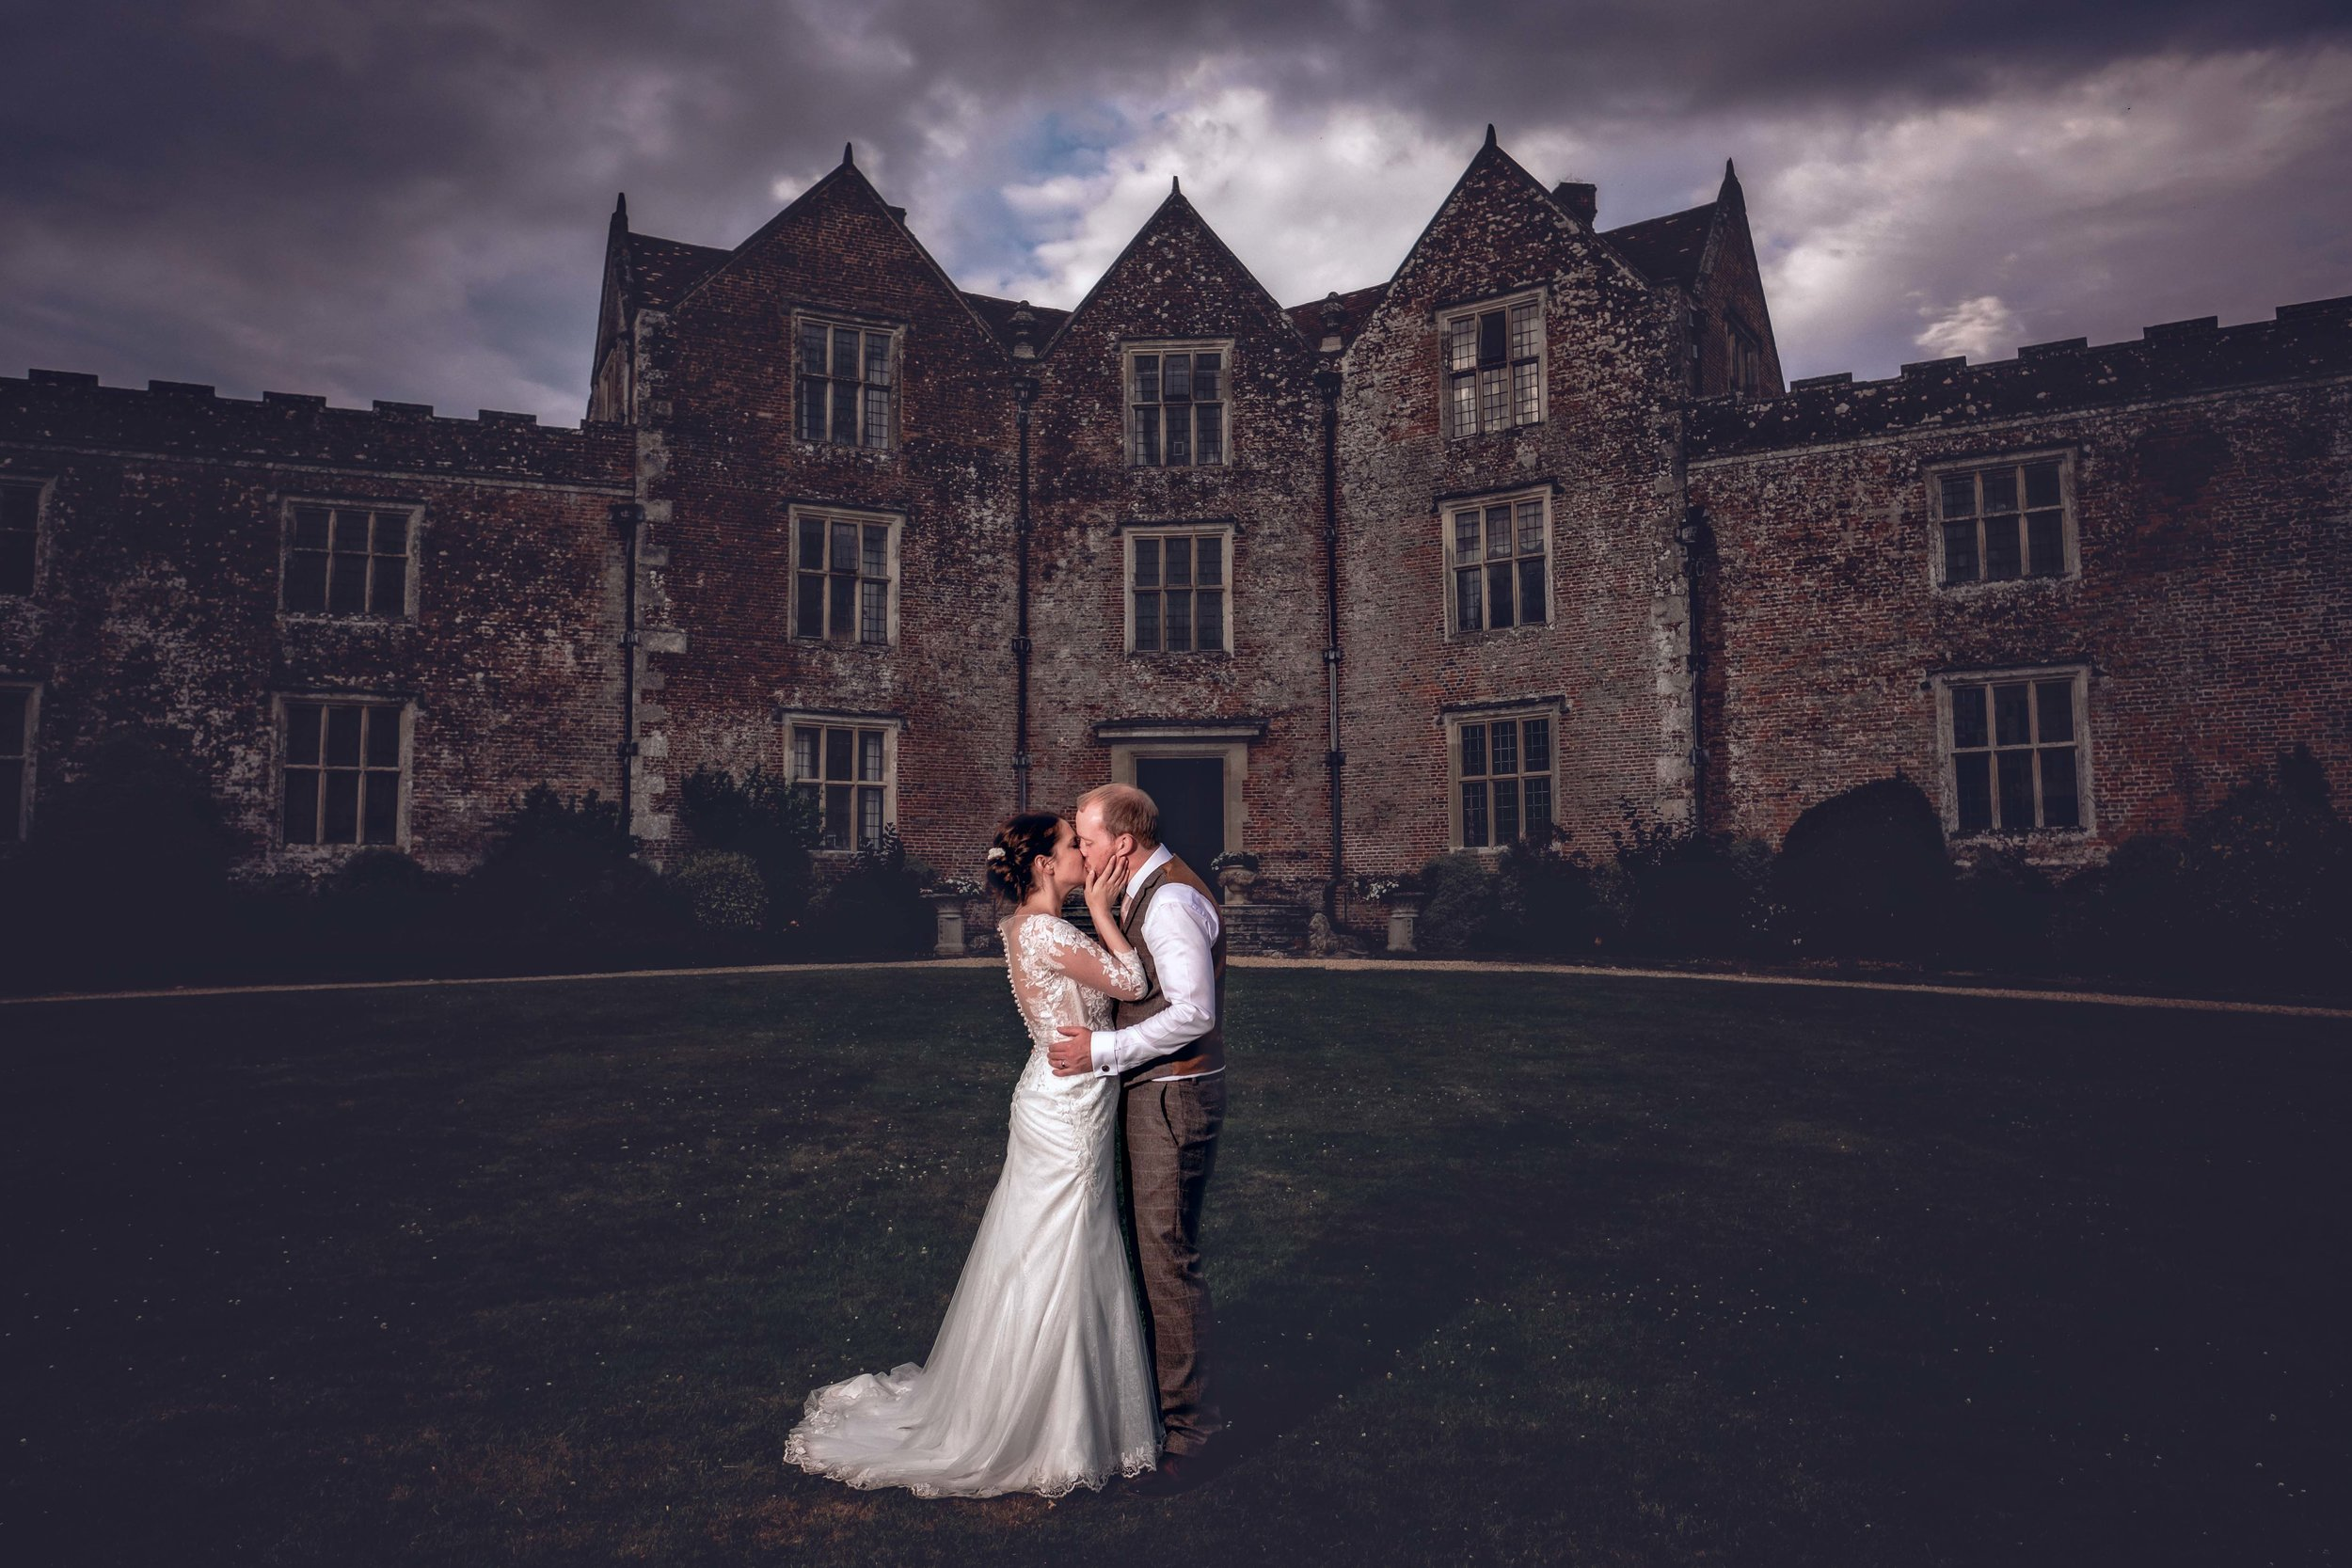 New House Estate weddings